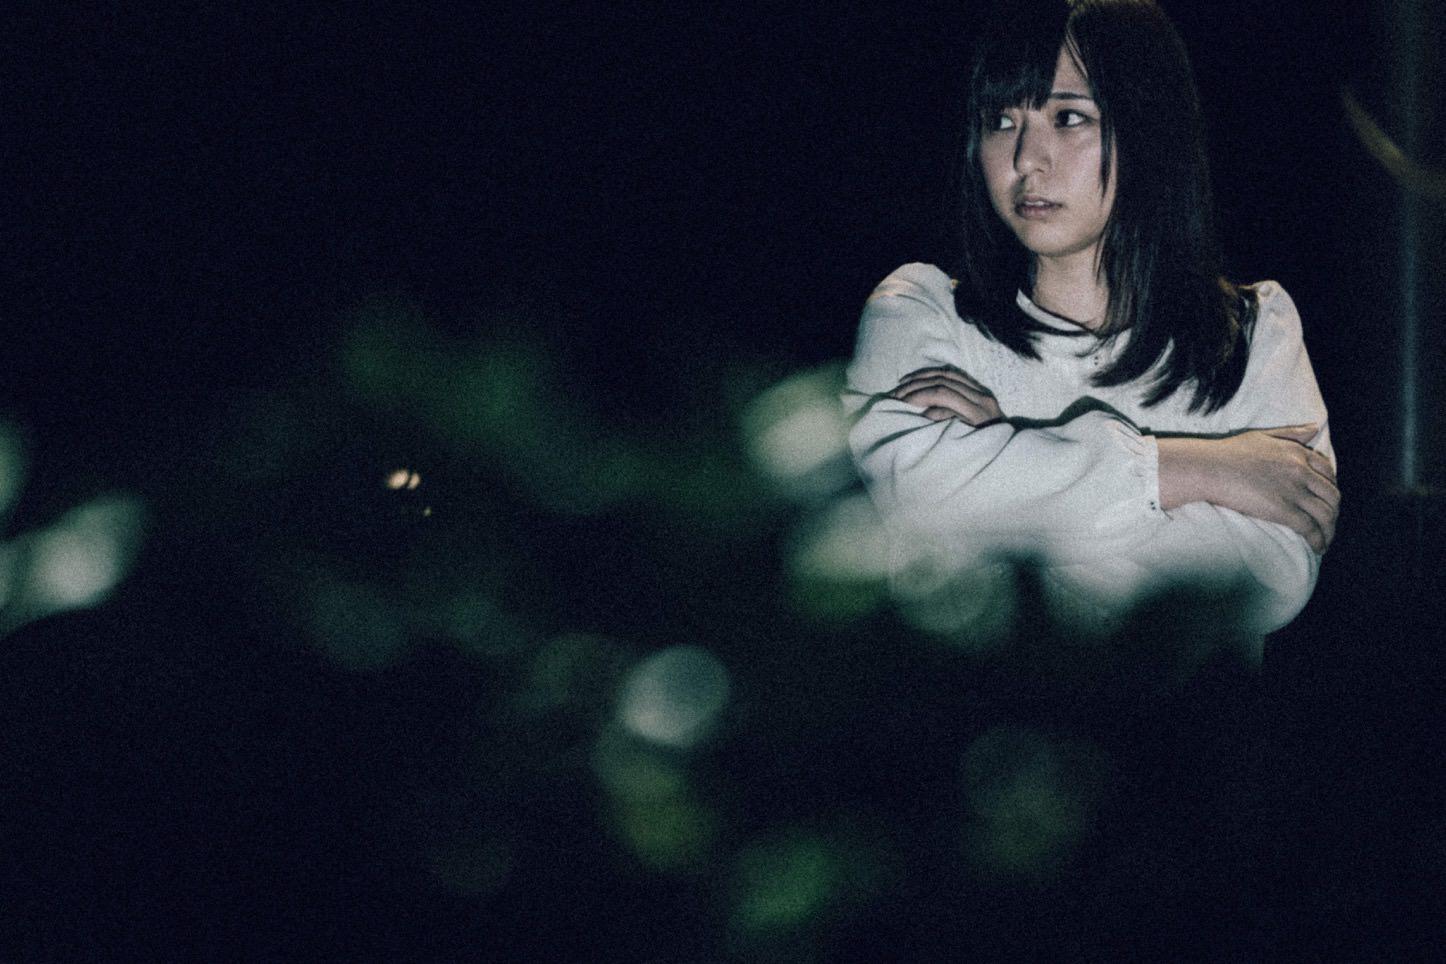 Pakutaso-Horror-Free-Stock-Photos-81.jpg